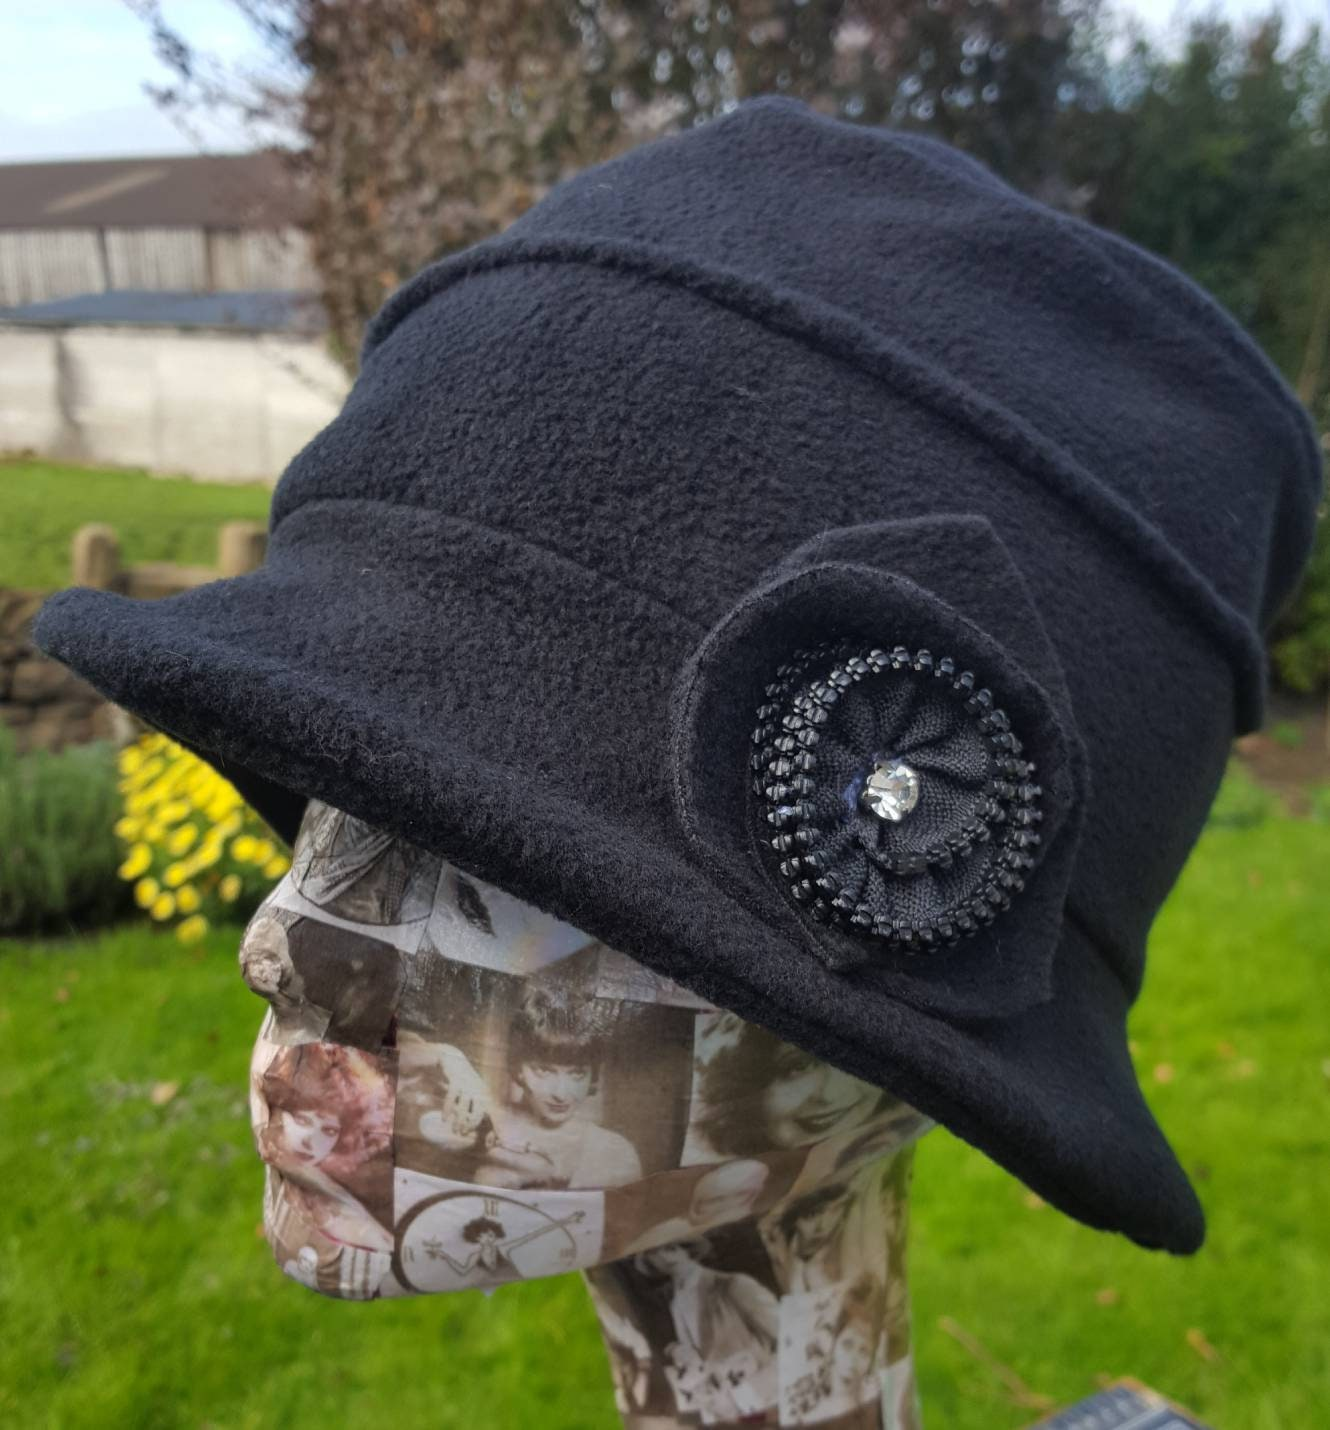 274d78fc3db Cosy Black Fleece Hat with Zip Flower detail and Fleece Lining